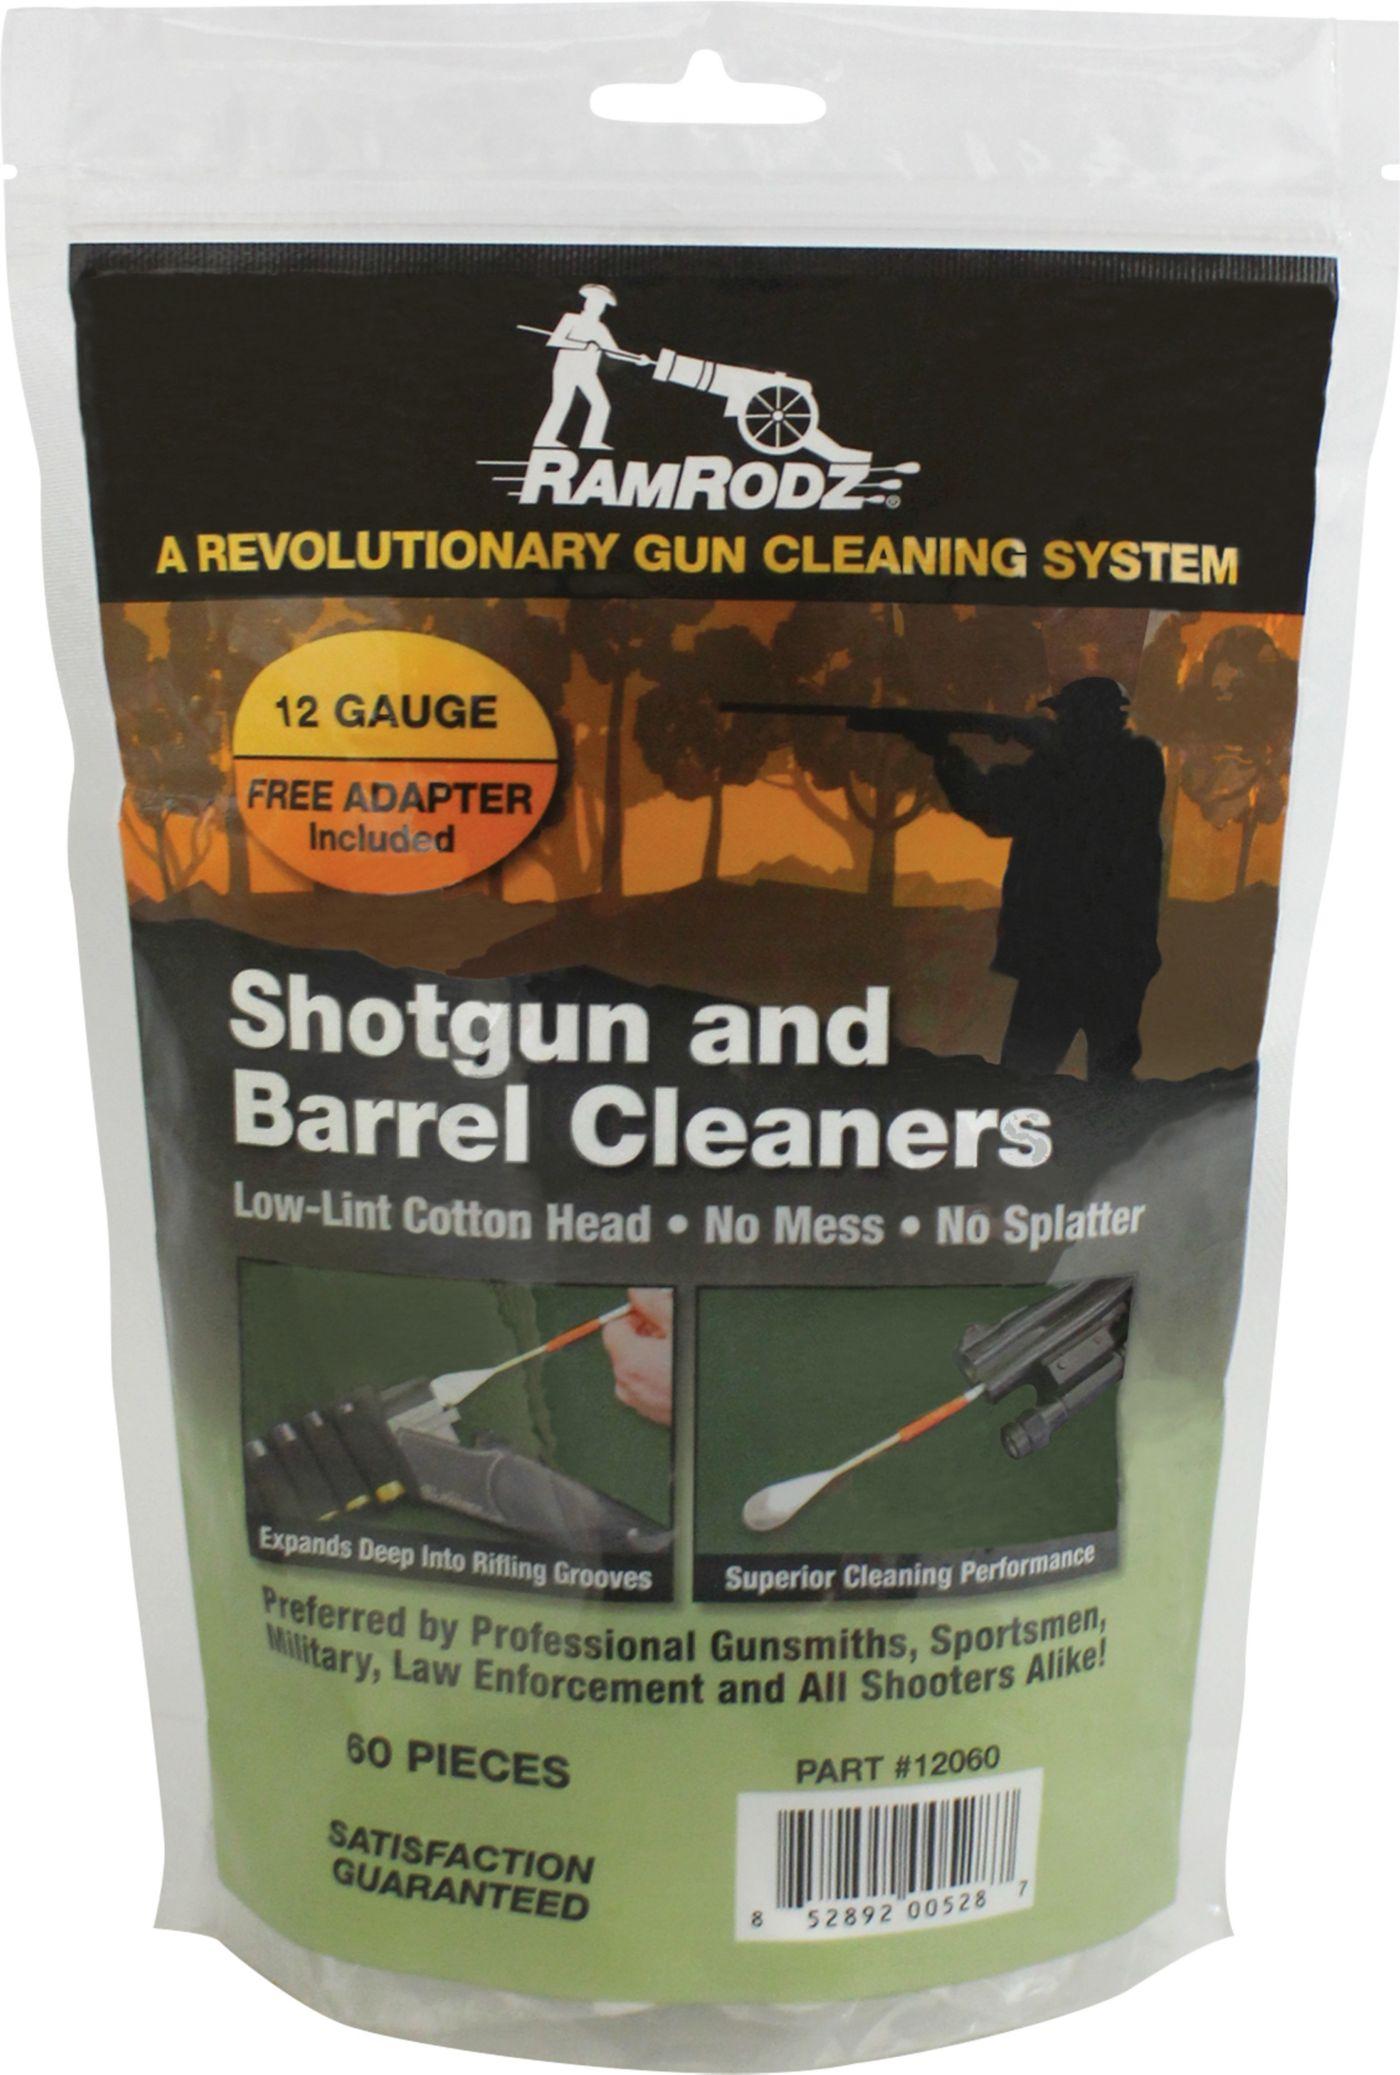 RamRodz 12 Gauge Shotgun and Barrel Cleaners – 60 Swabs